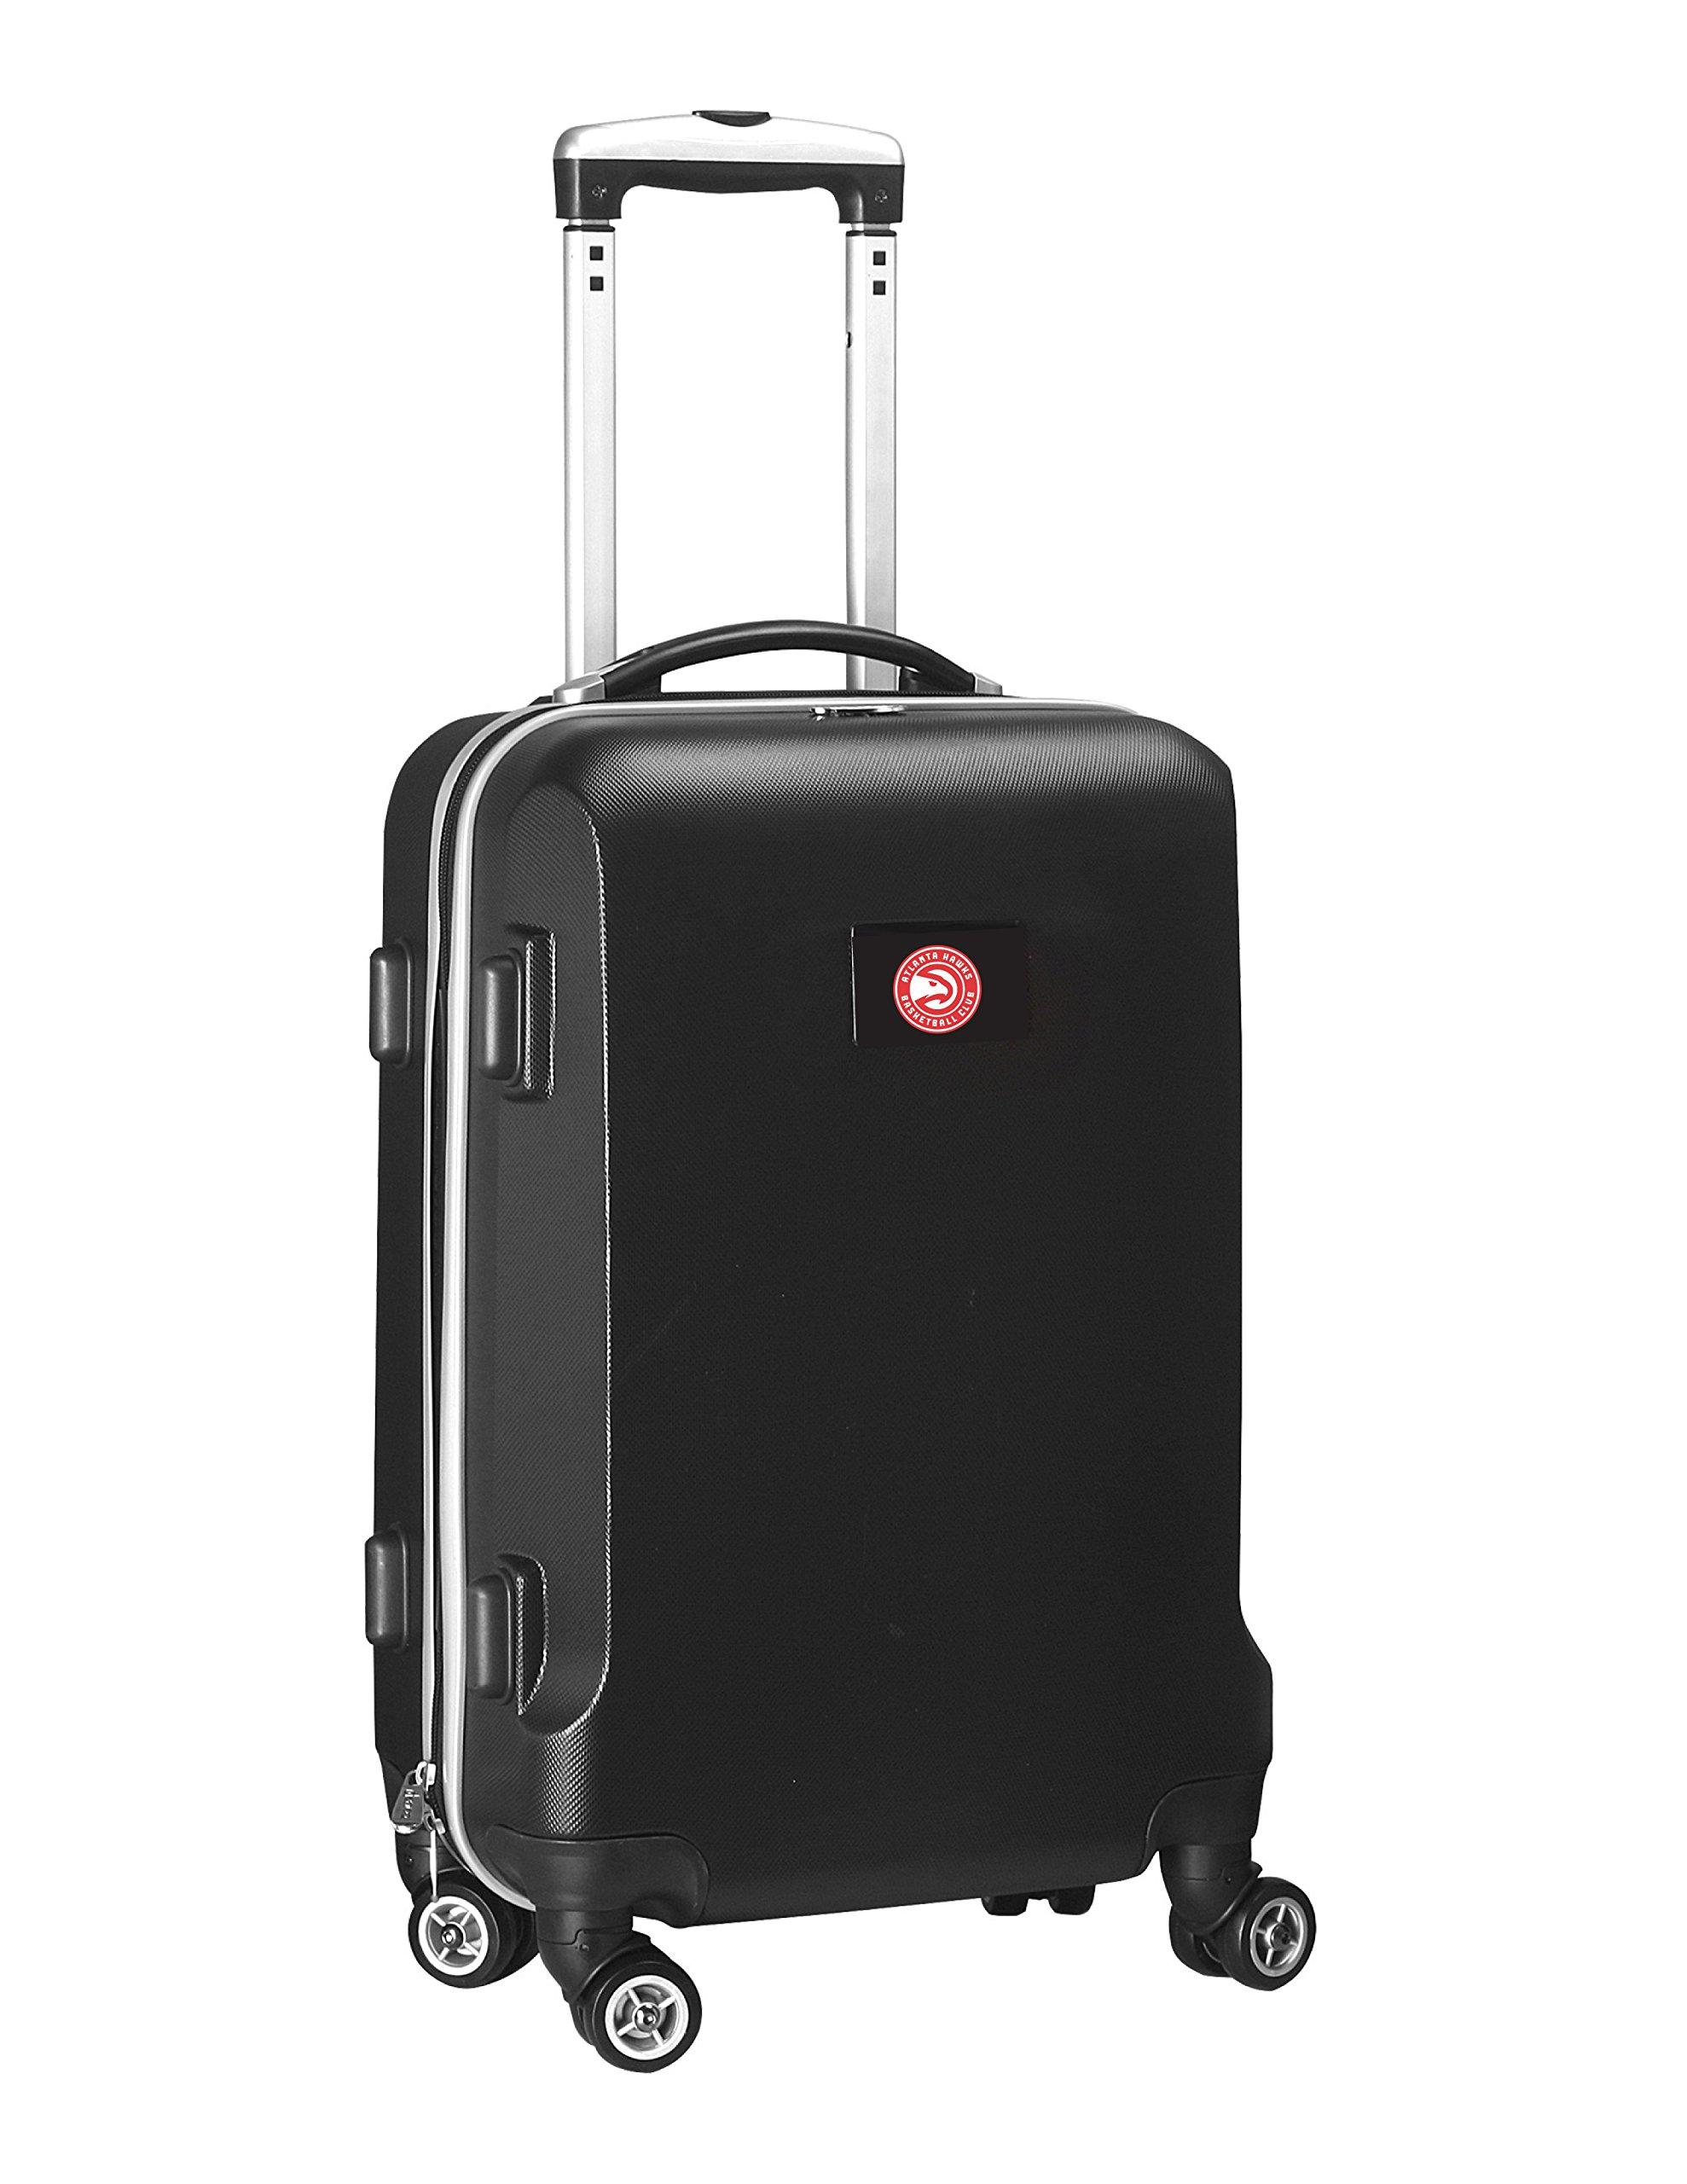 Denco NBA Atlanta Hawks Carry-On Hardcase Luggage Spinner, Black